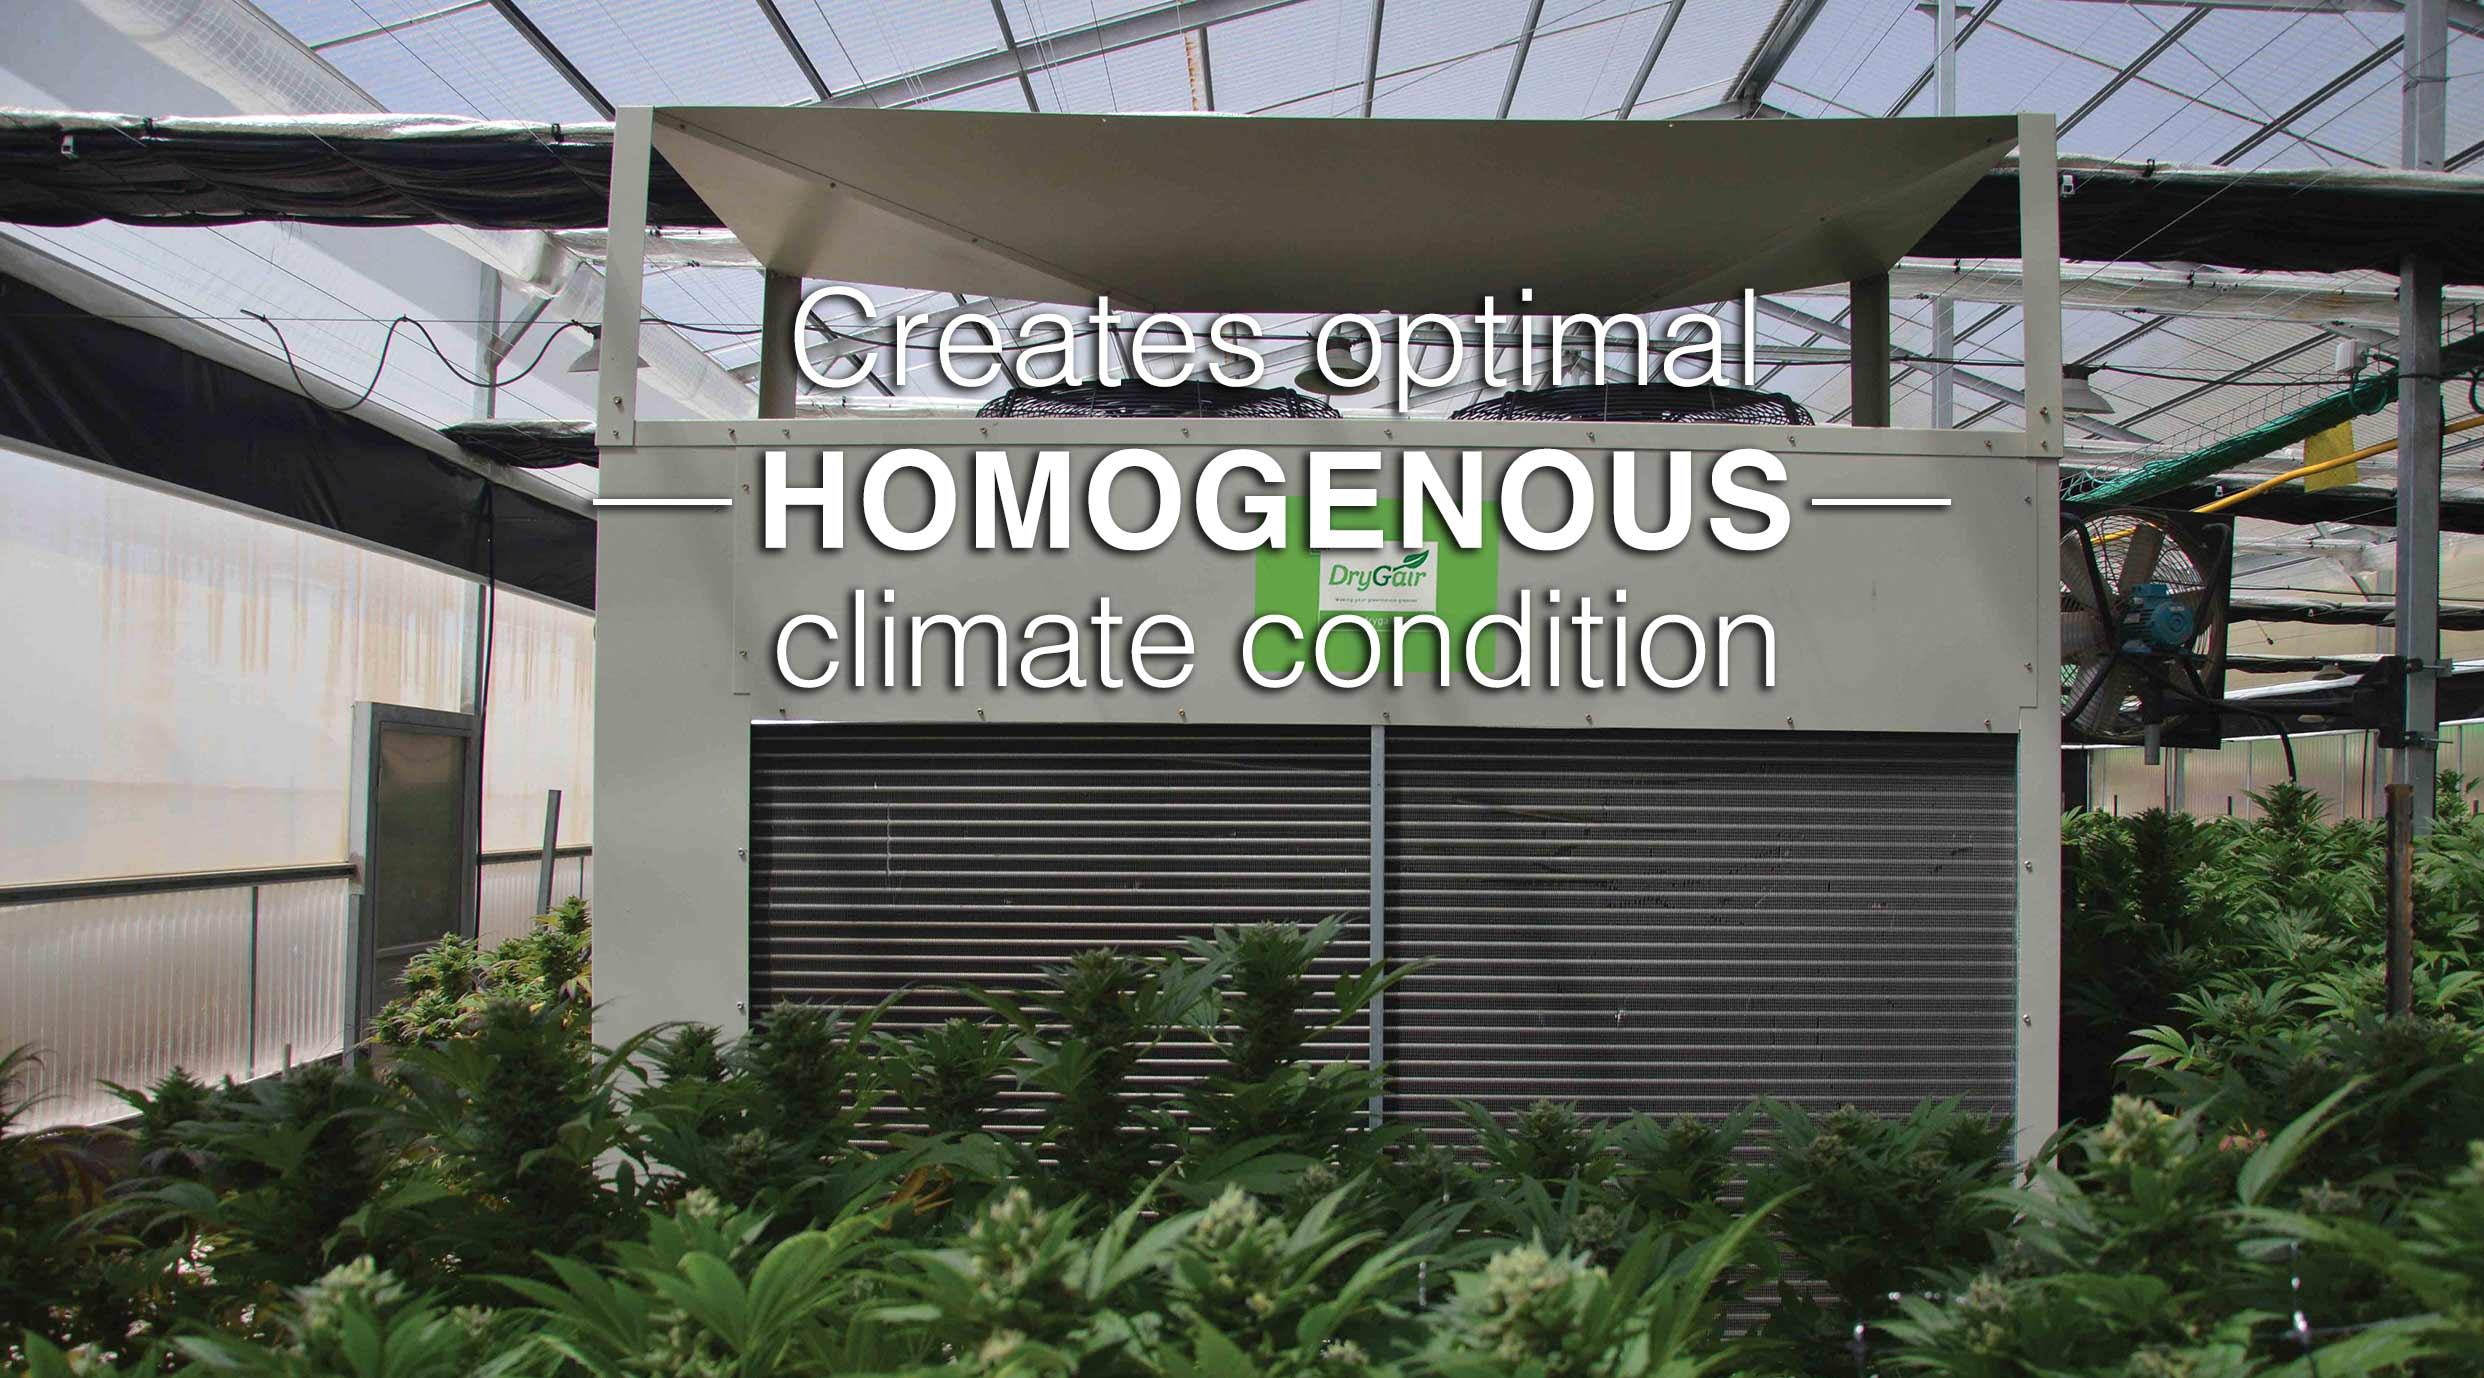 Drygair dehumidifier creates optimal homogenous climate conditions